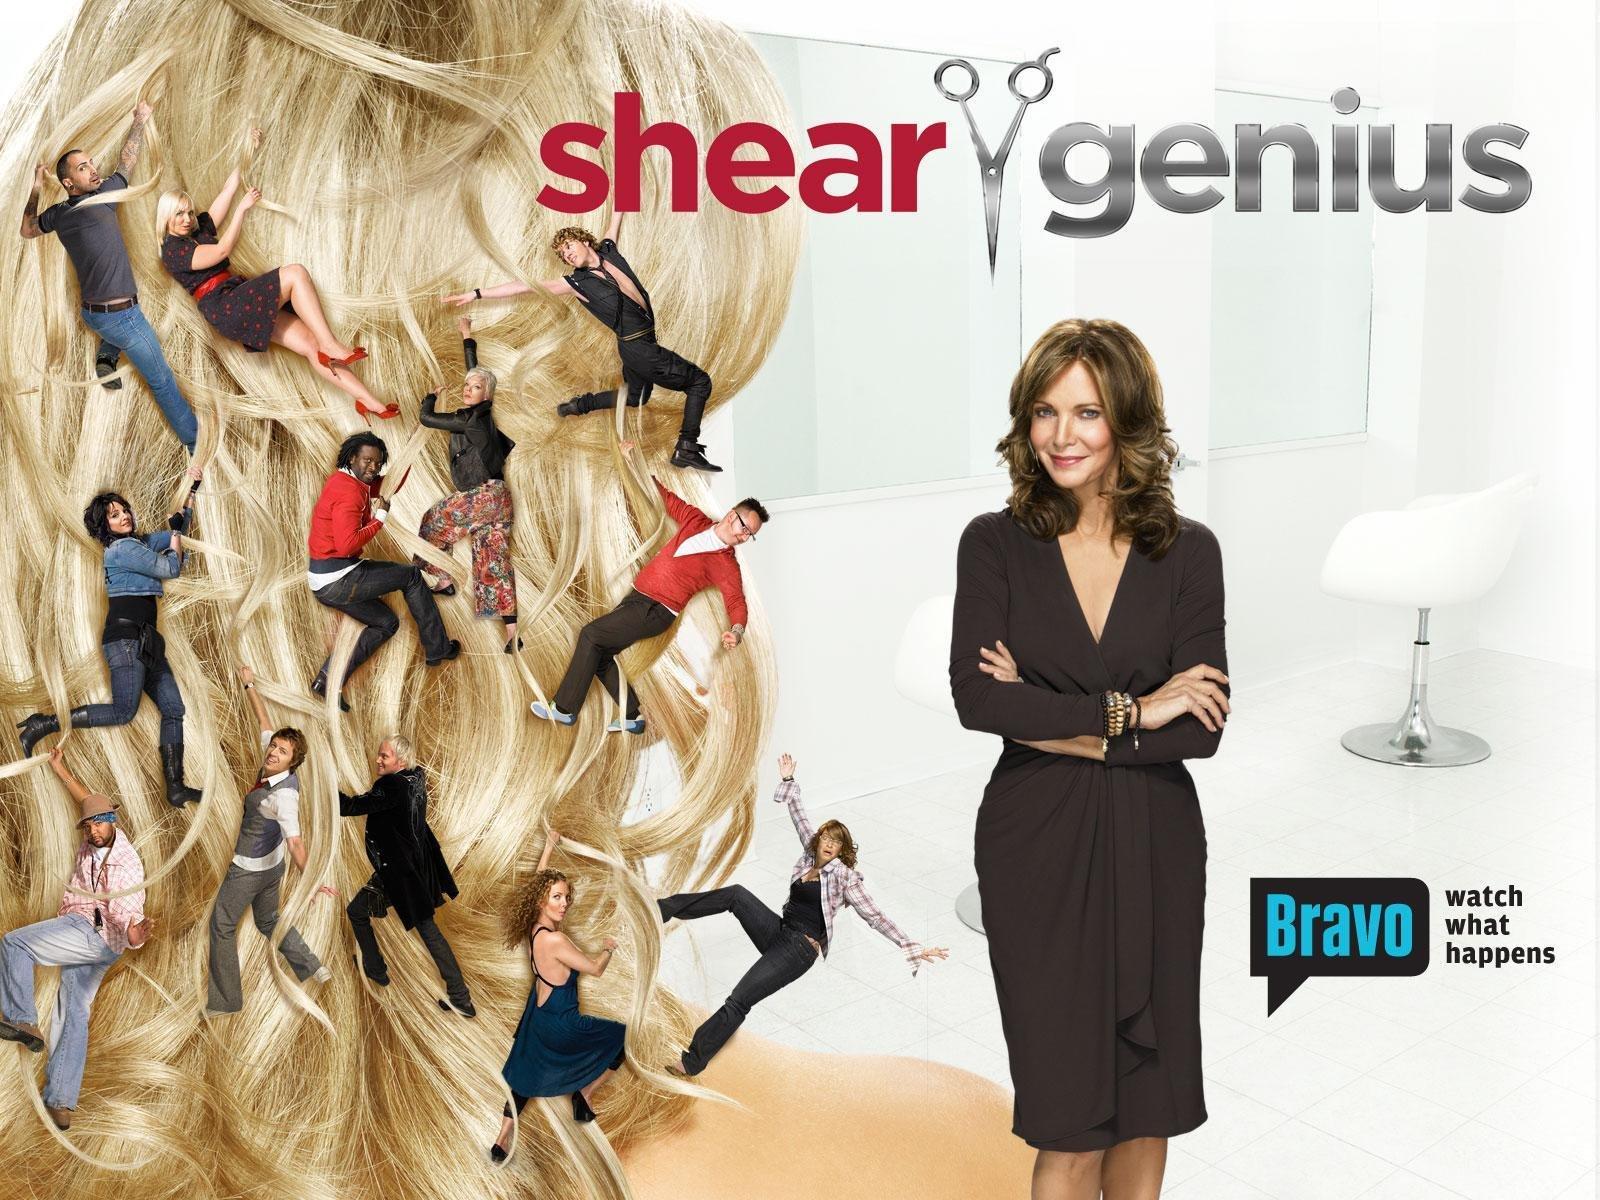 Shear genius from Amazon